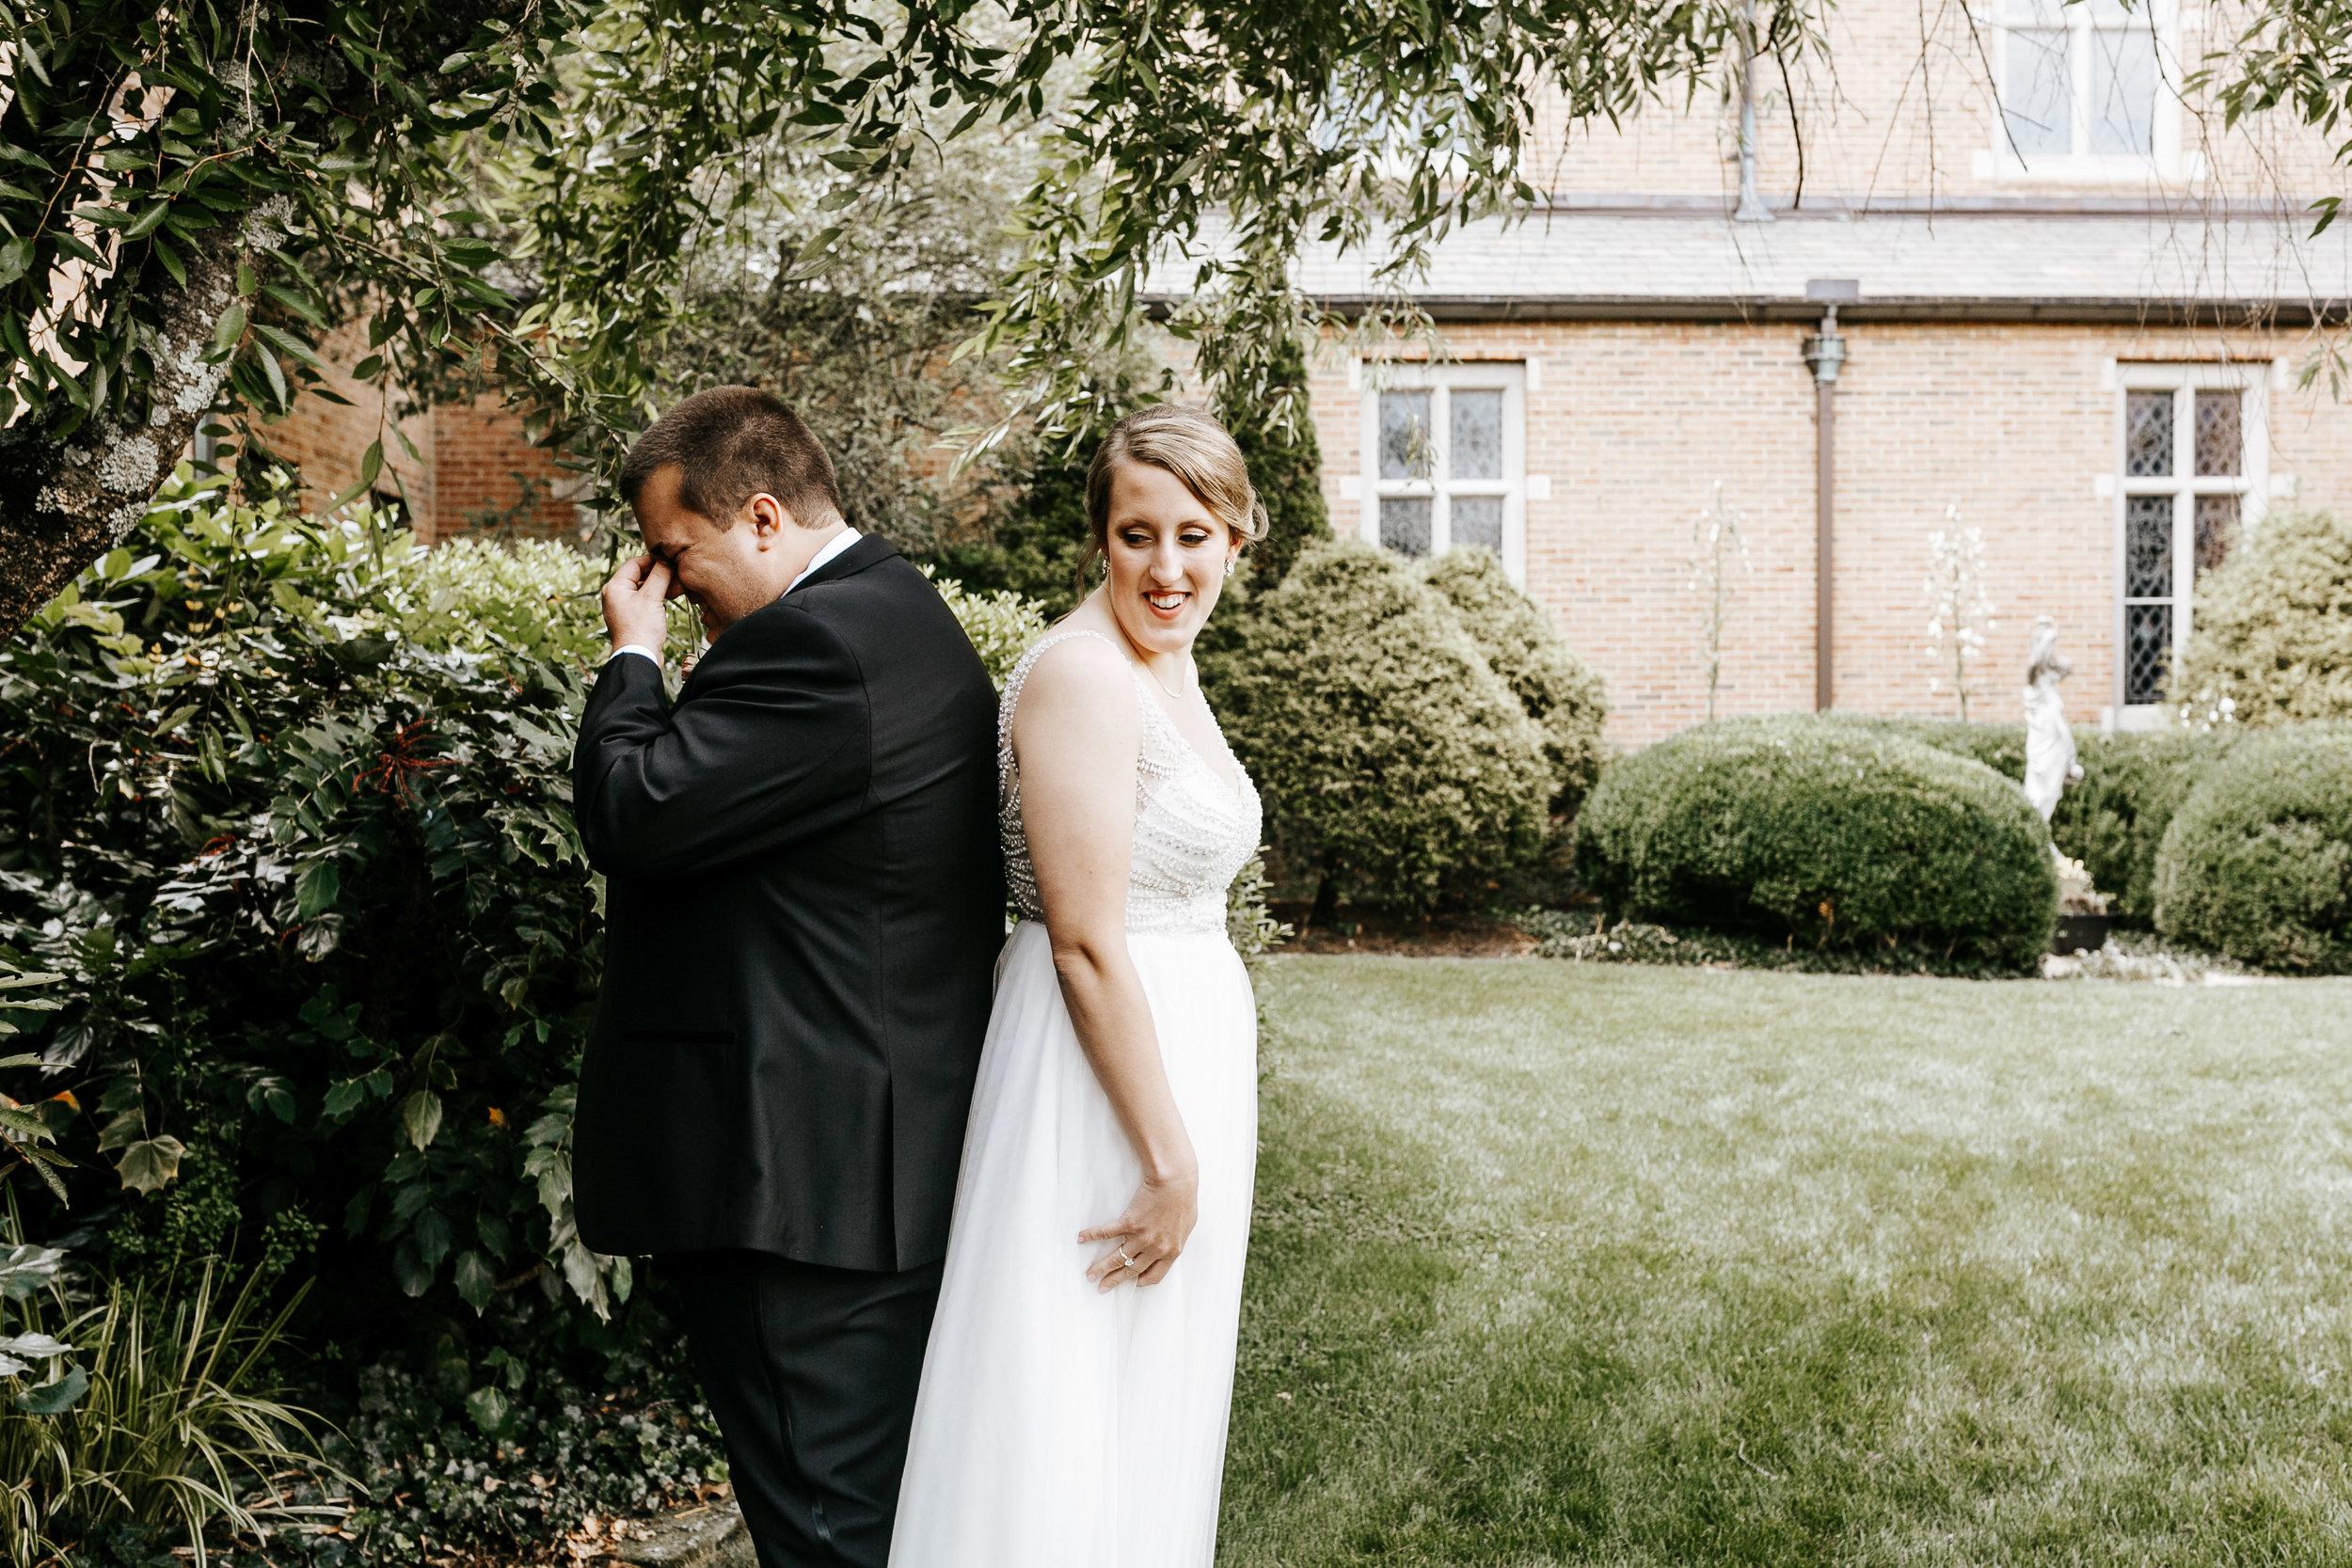 bohemian-photographer-wedding-tennessee-30.jpg